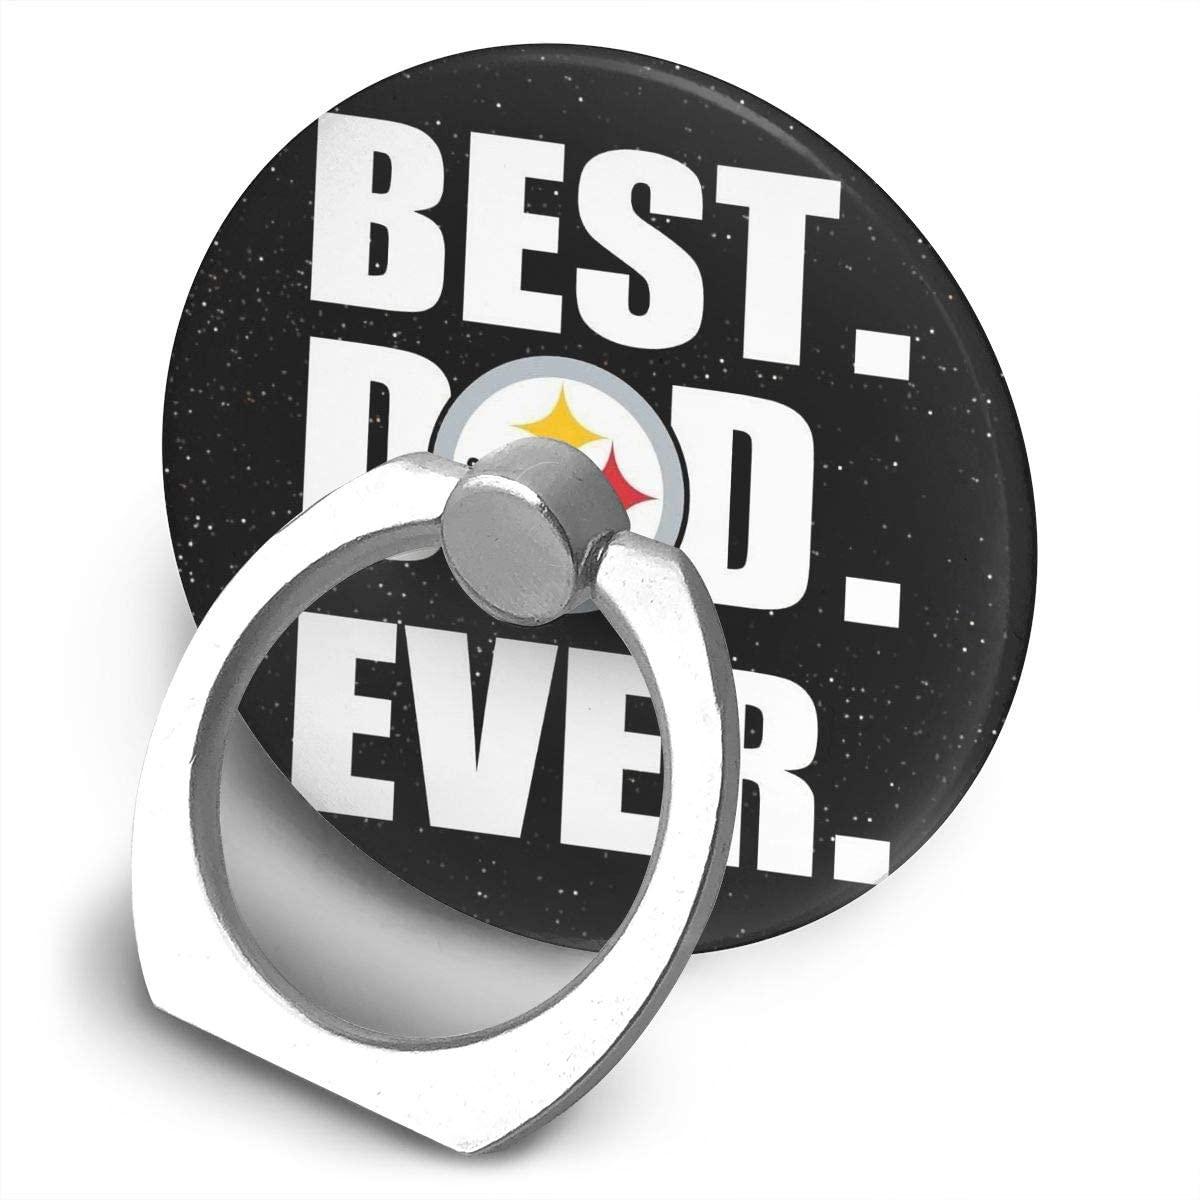 Ahdjagsads56 Pittsburgh 360 Degree Rotating Ring Stand Grip Mounts